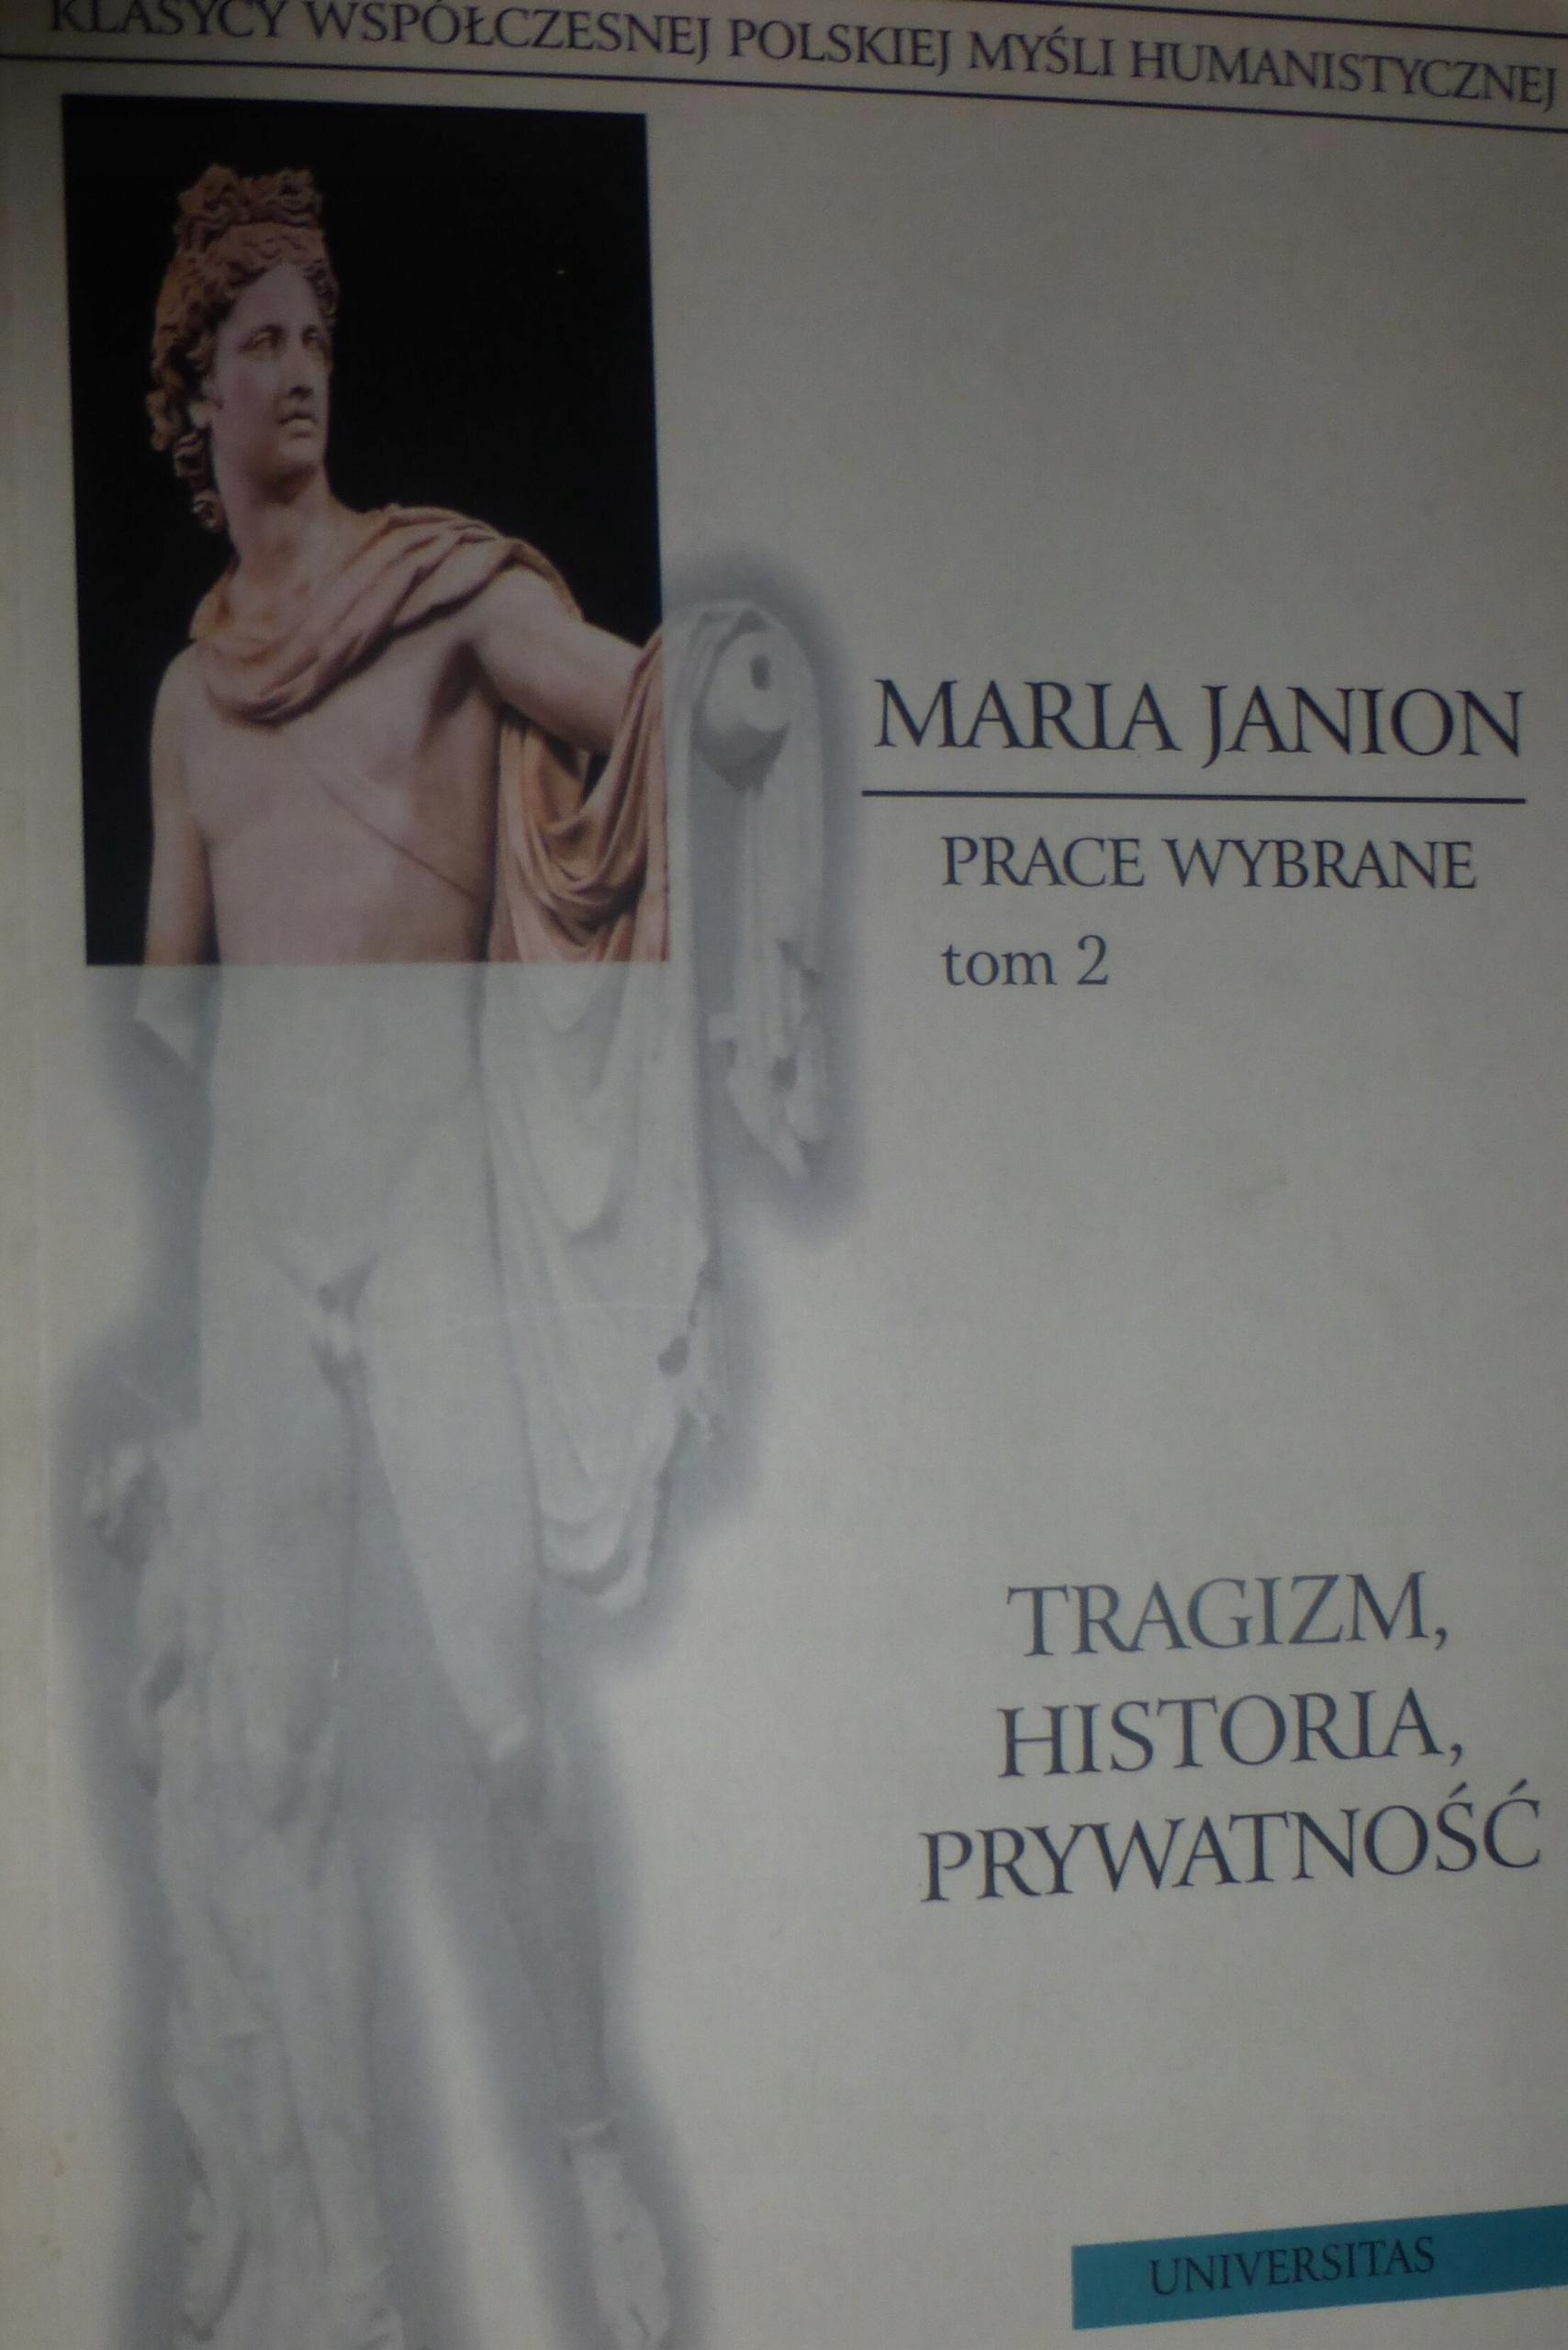 TRAGIZM HISTORIA PRYWATNOŚĆ t.2 Janion